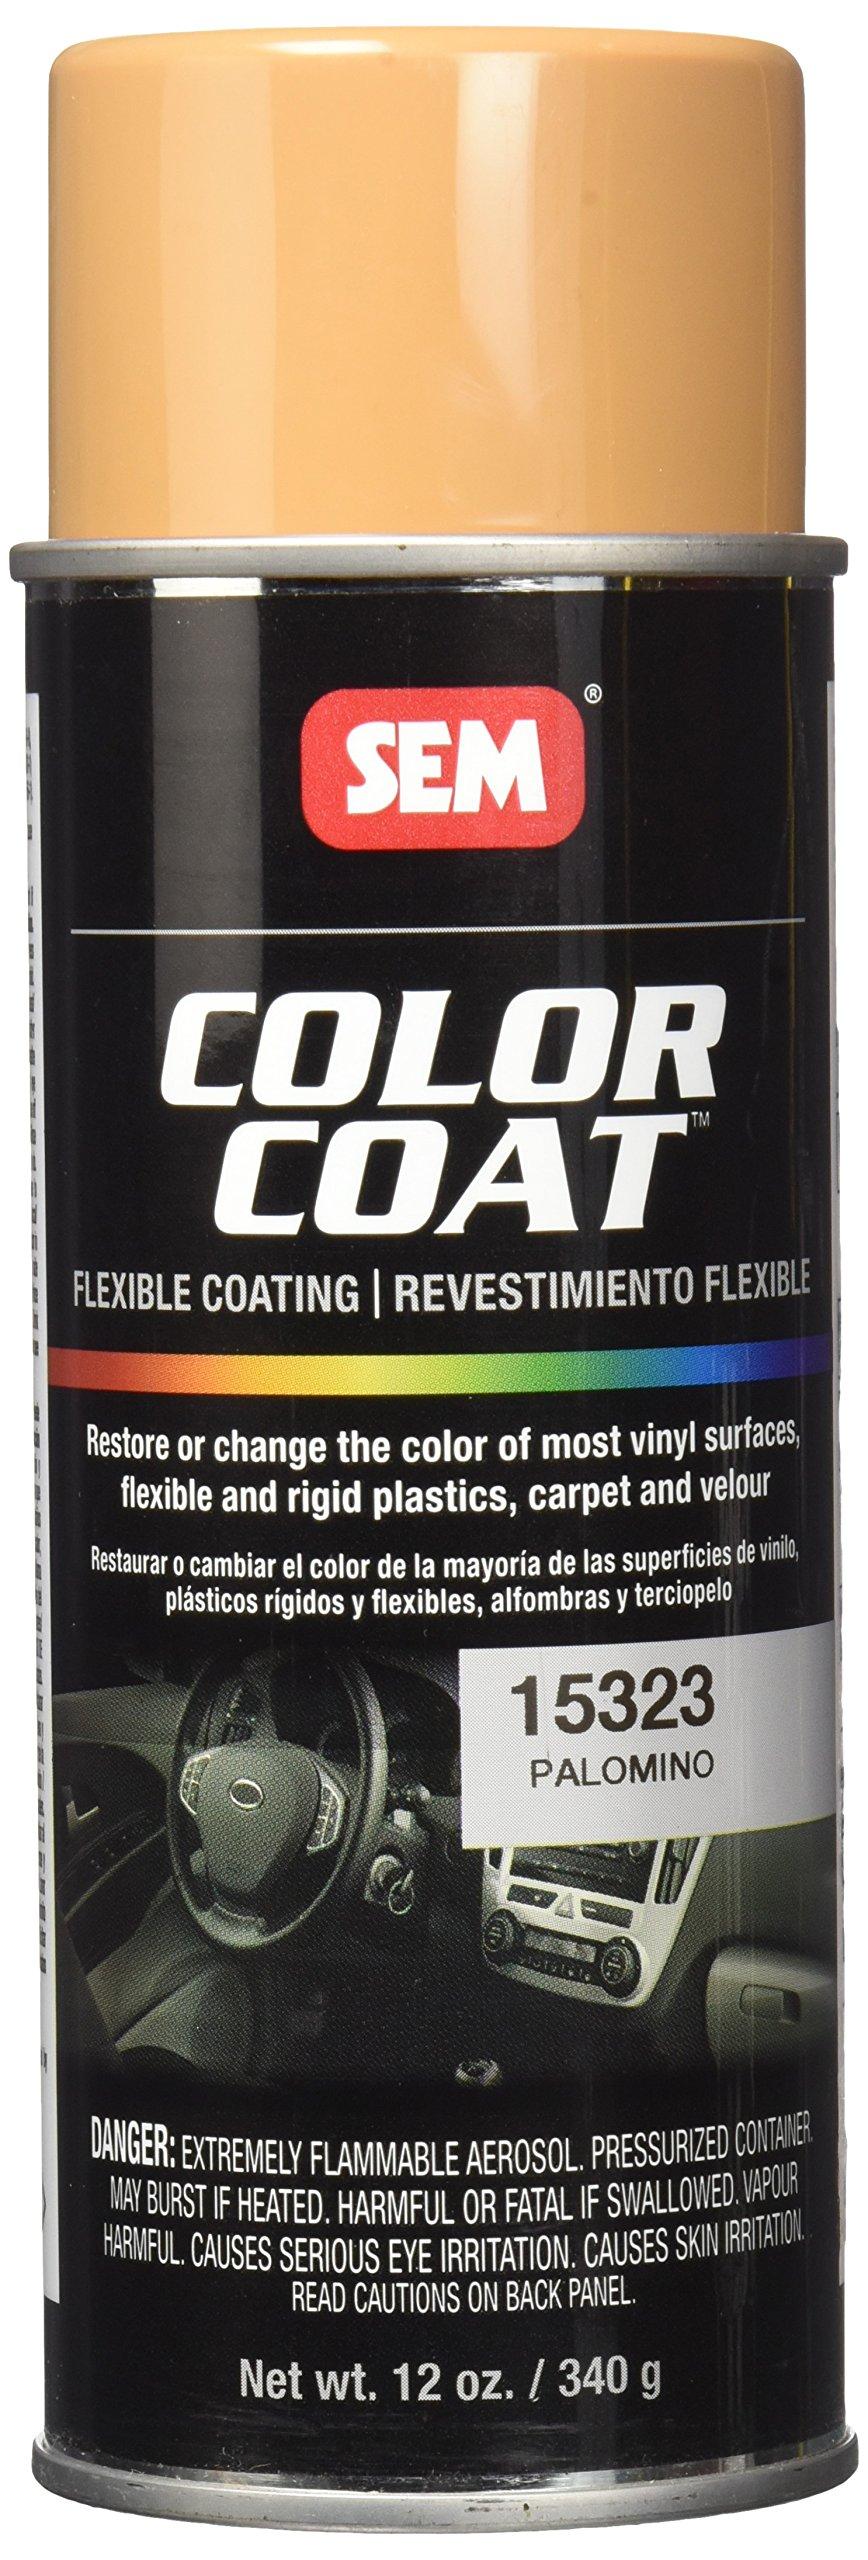 SEM Products 15323 Palomino Color Coat - 12 oz.